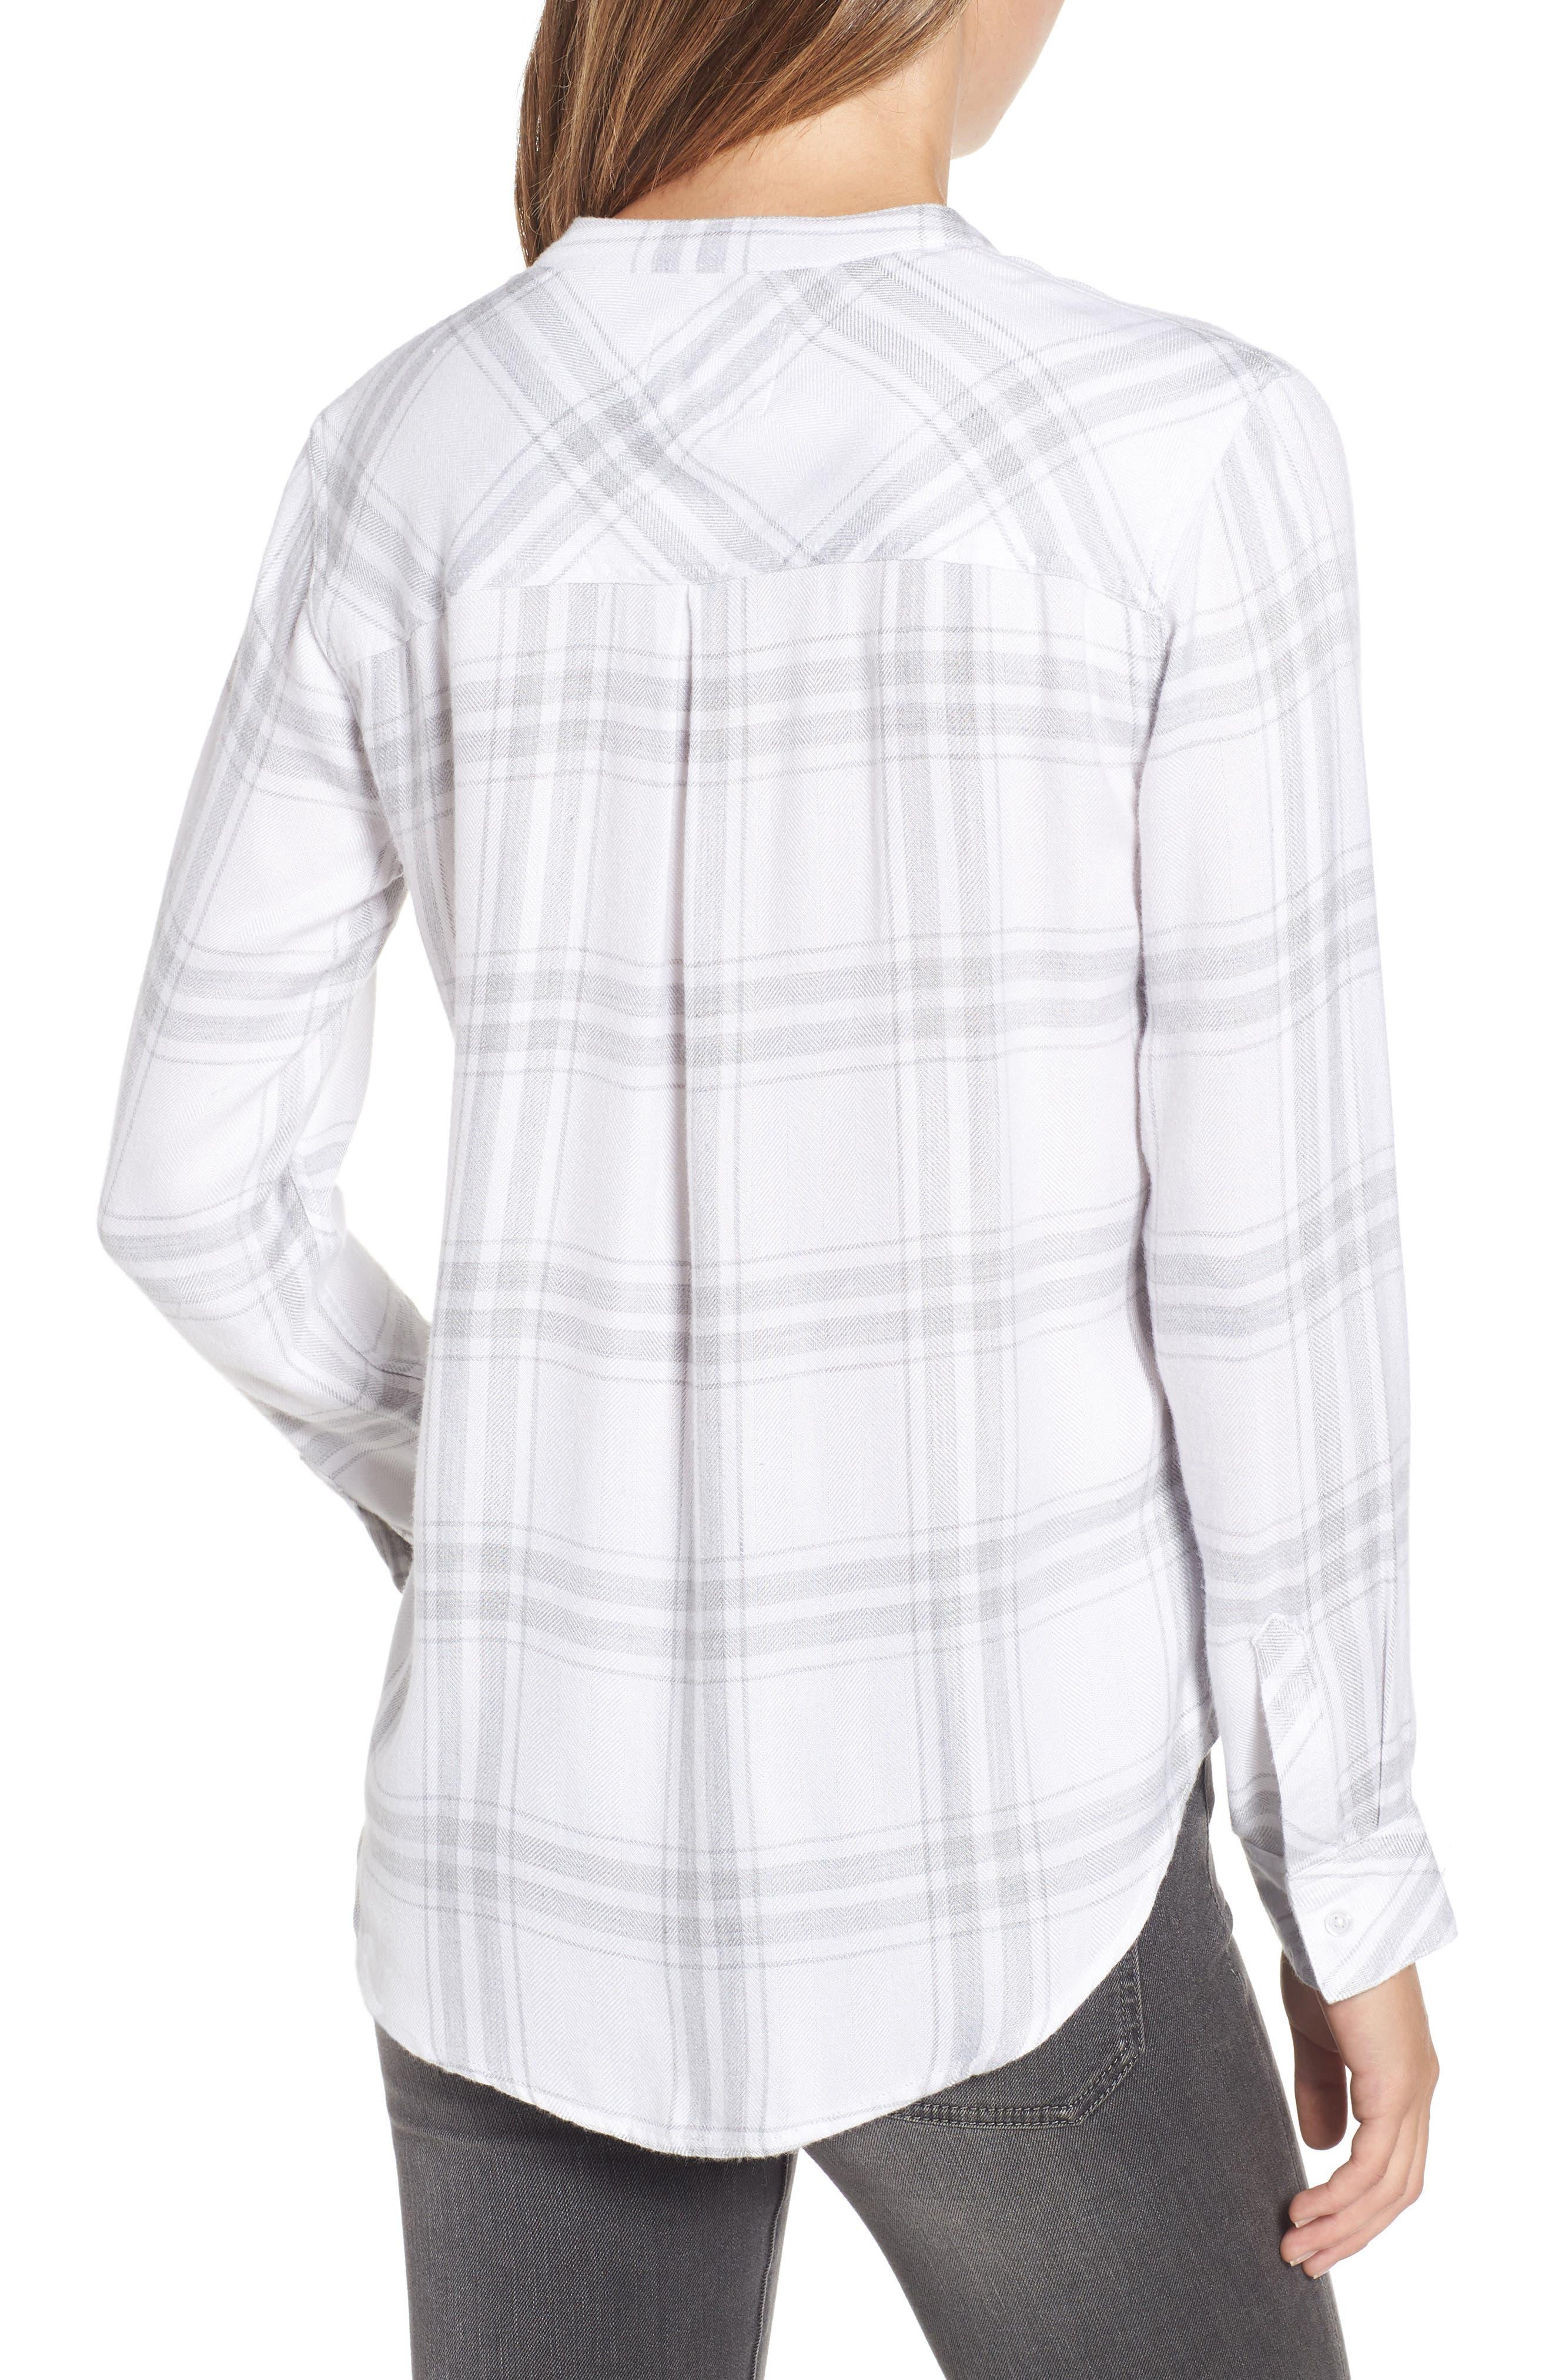 Allison Plaid Shirt,                             Alternate thumbnail 2, color,                             WHITE SILVER